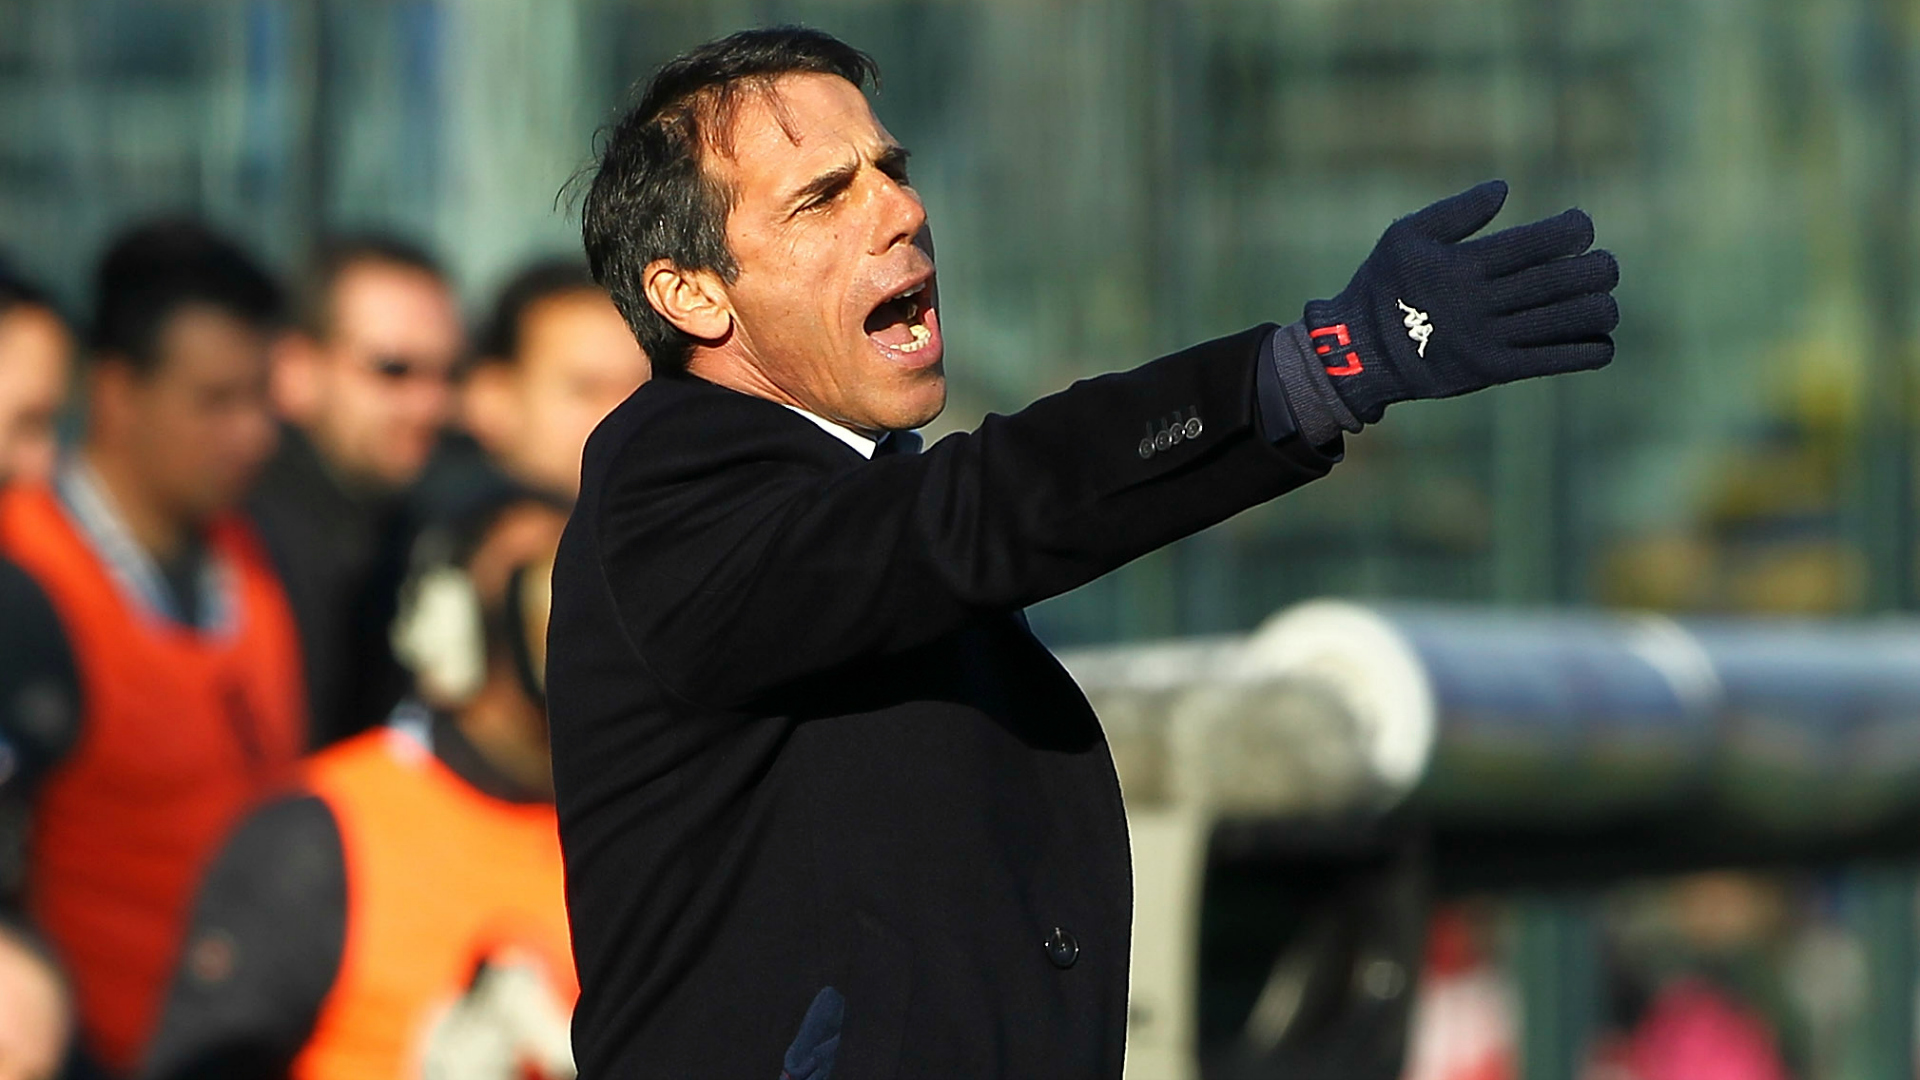 Calcio, Gianfranco Zola conferma: